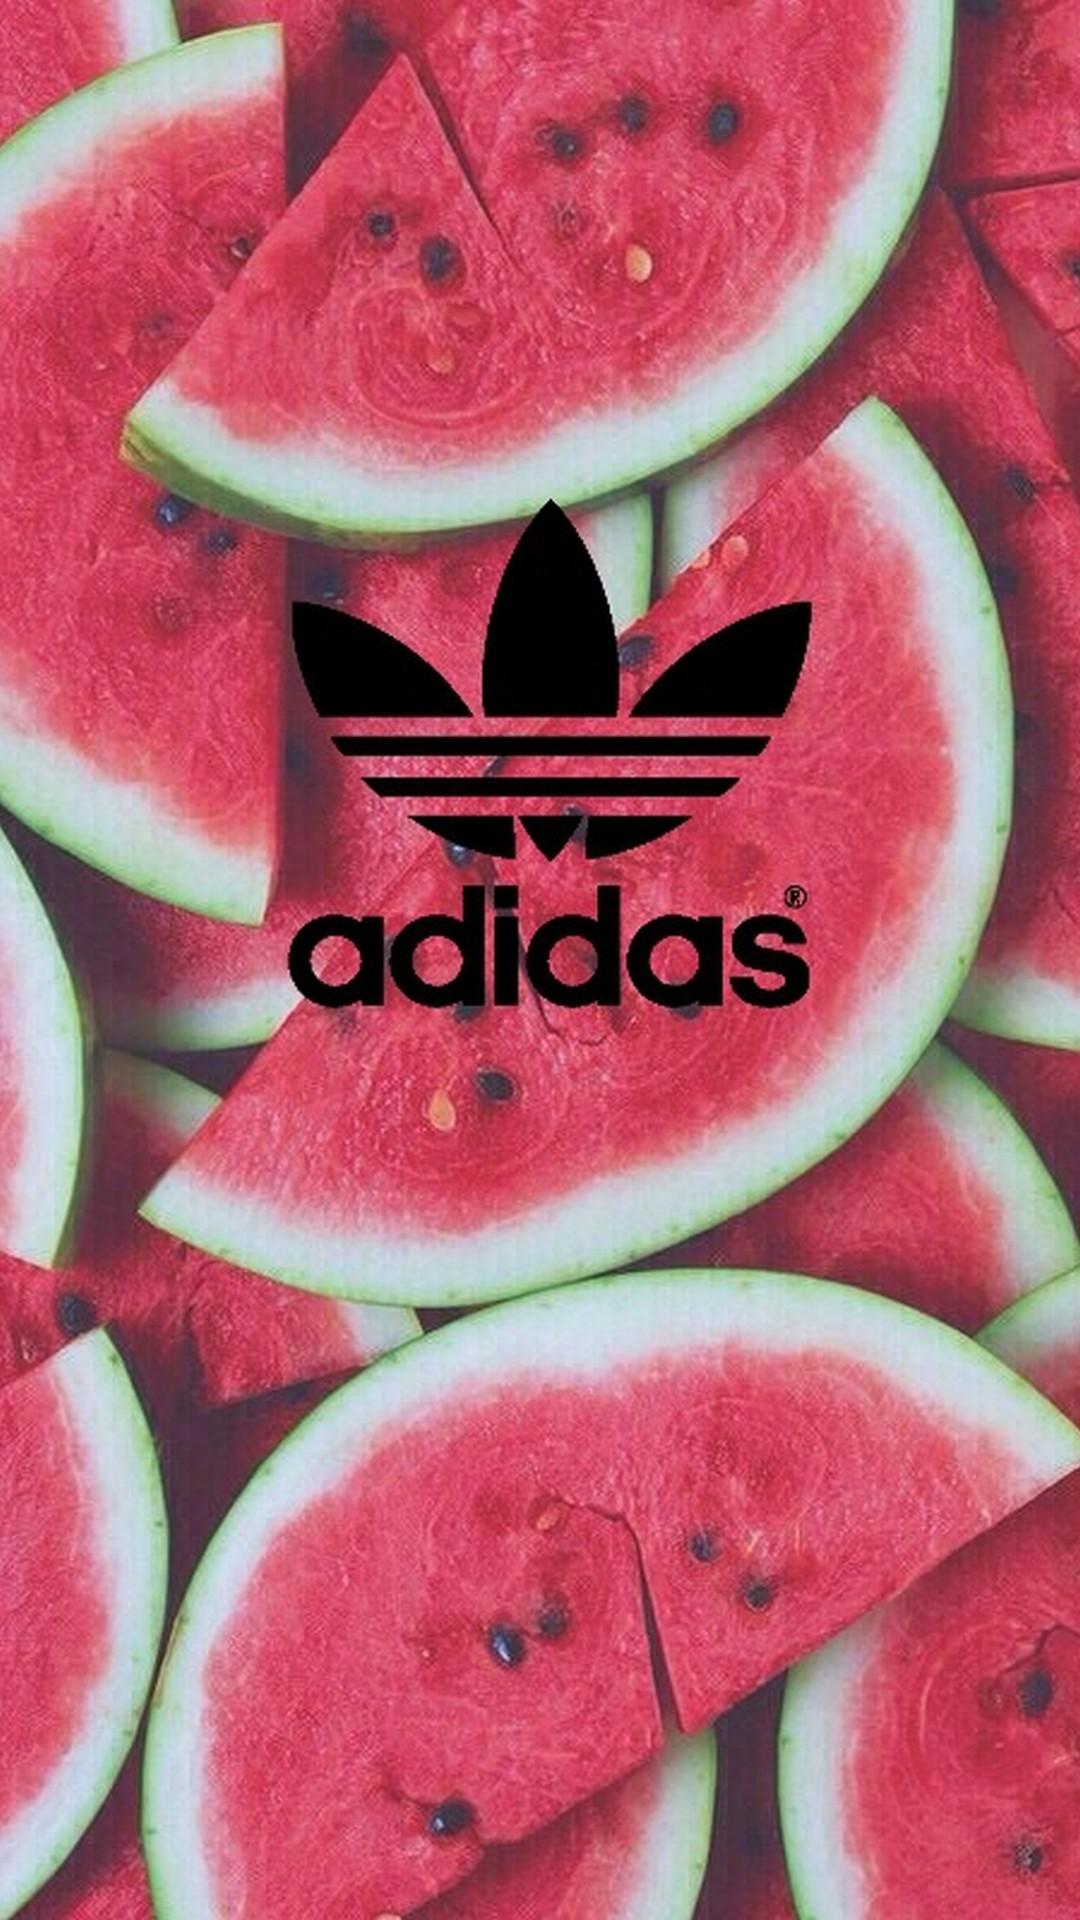 Wallpaper iPhone Adidas 2021 Cute Wallpapers 1080x1920